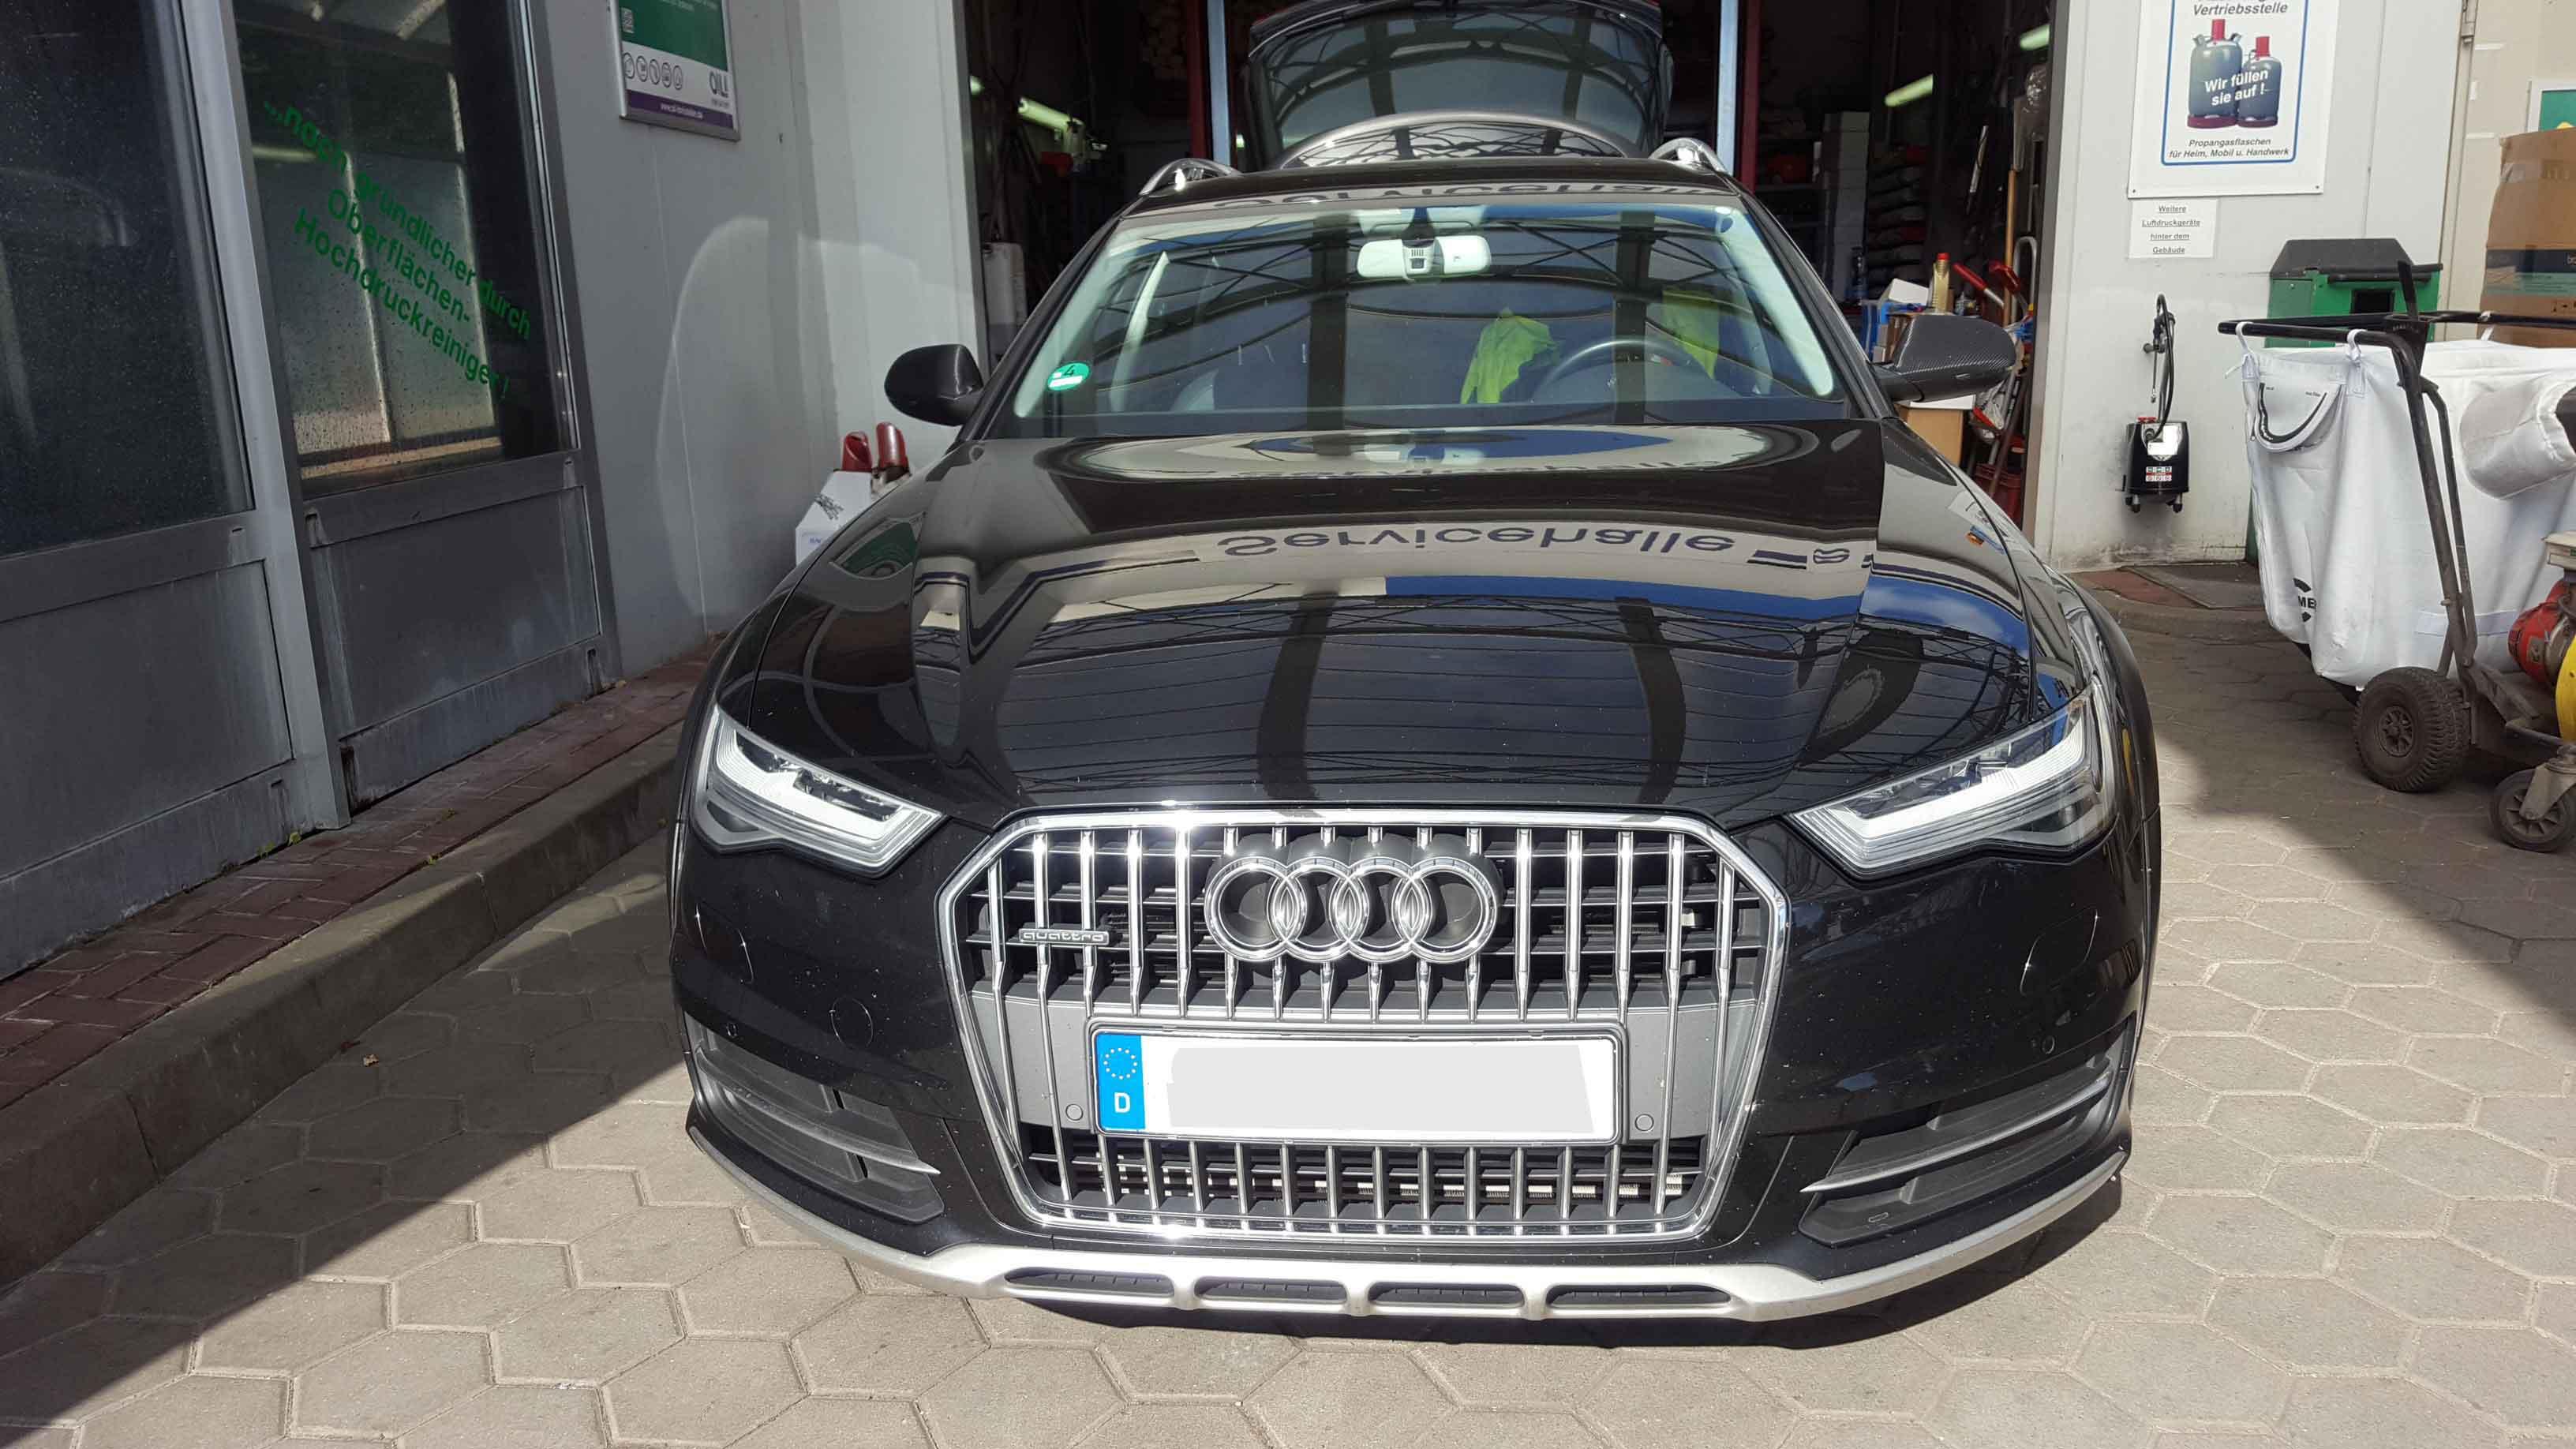 Audi A6 4g Allroad Facelift Active Sound Retrofitting New Muffler And Encodings Cete Automotive Gmbh